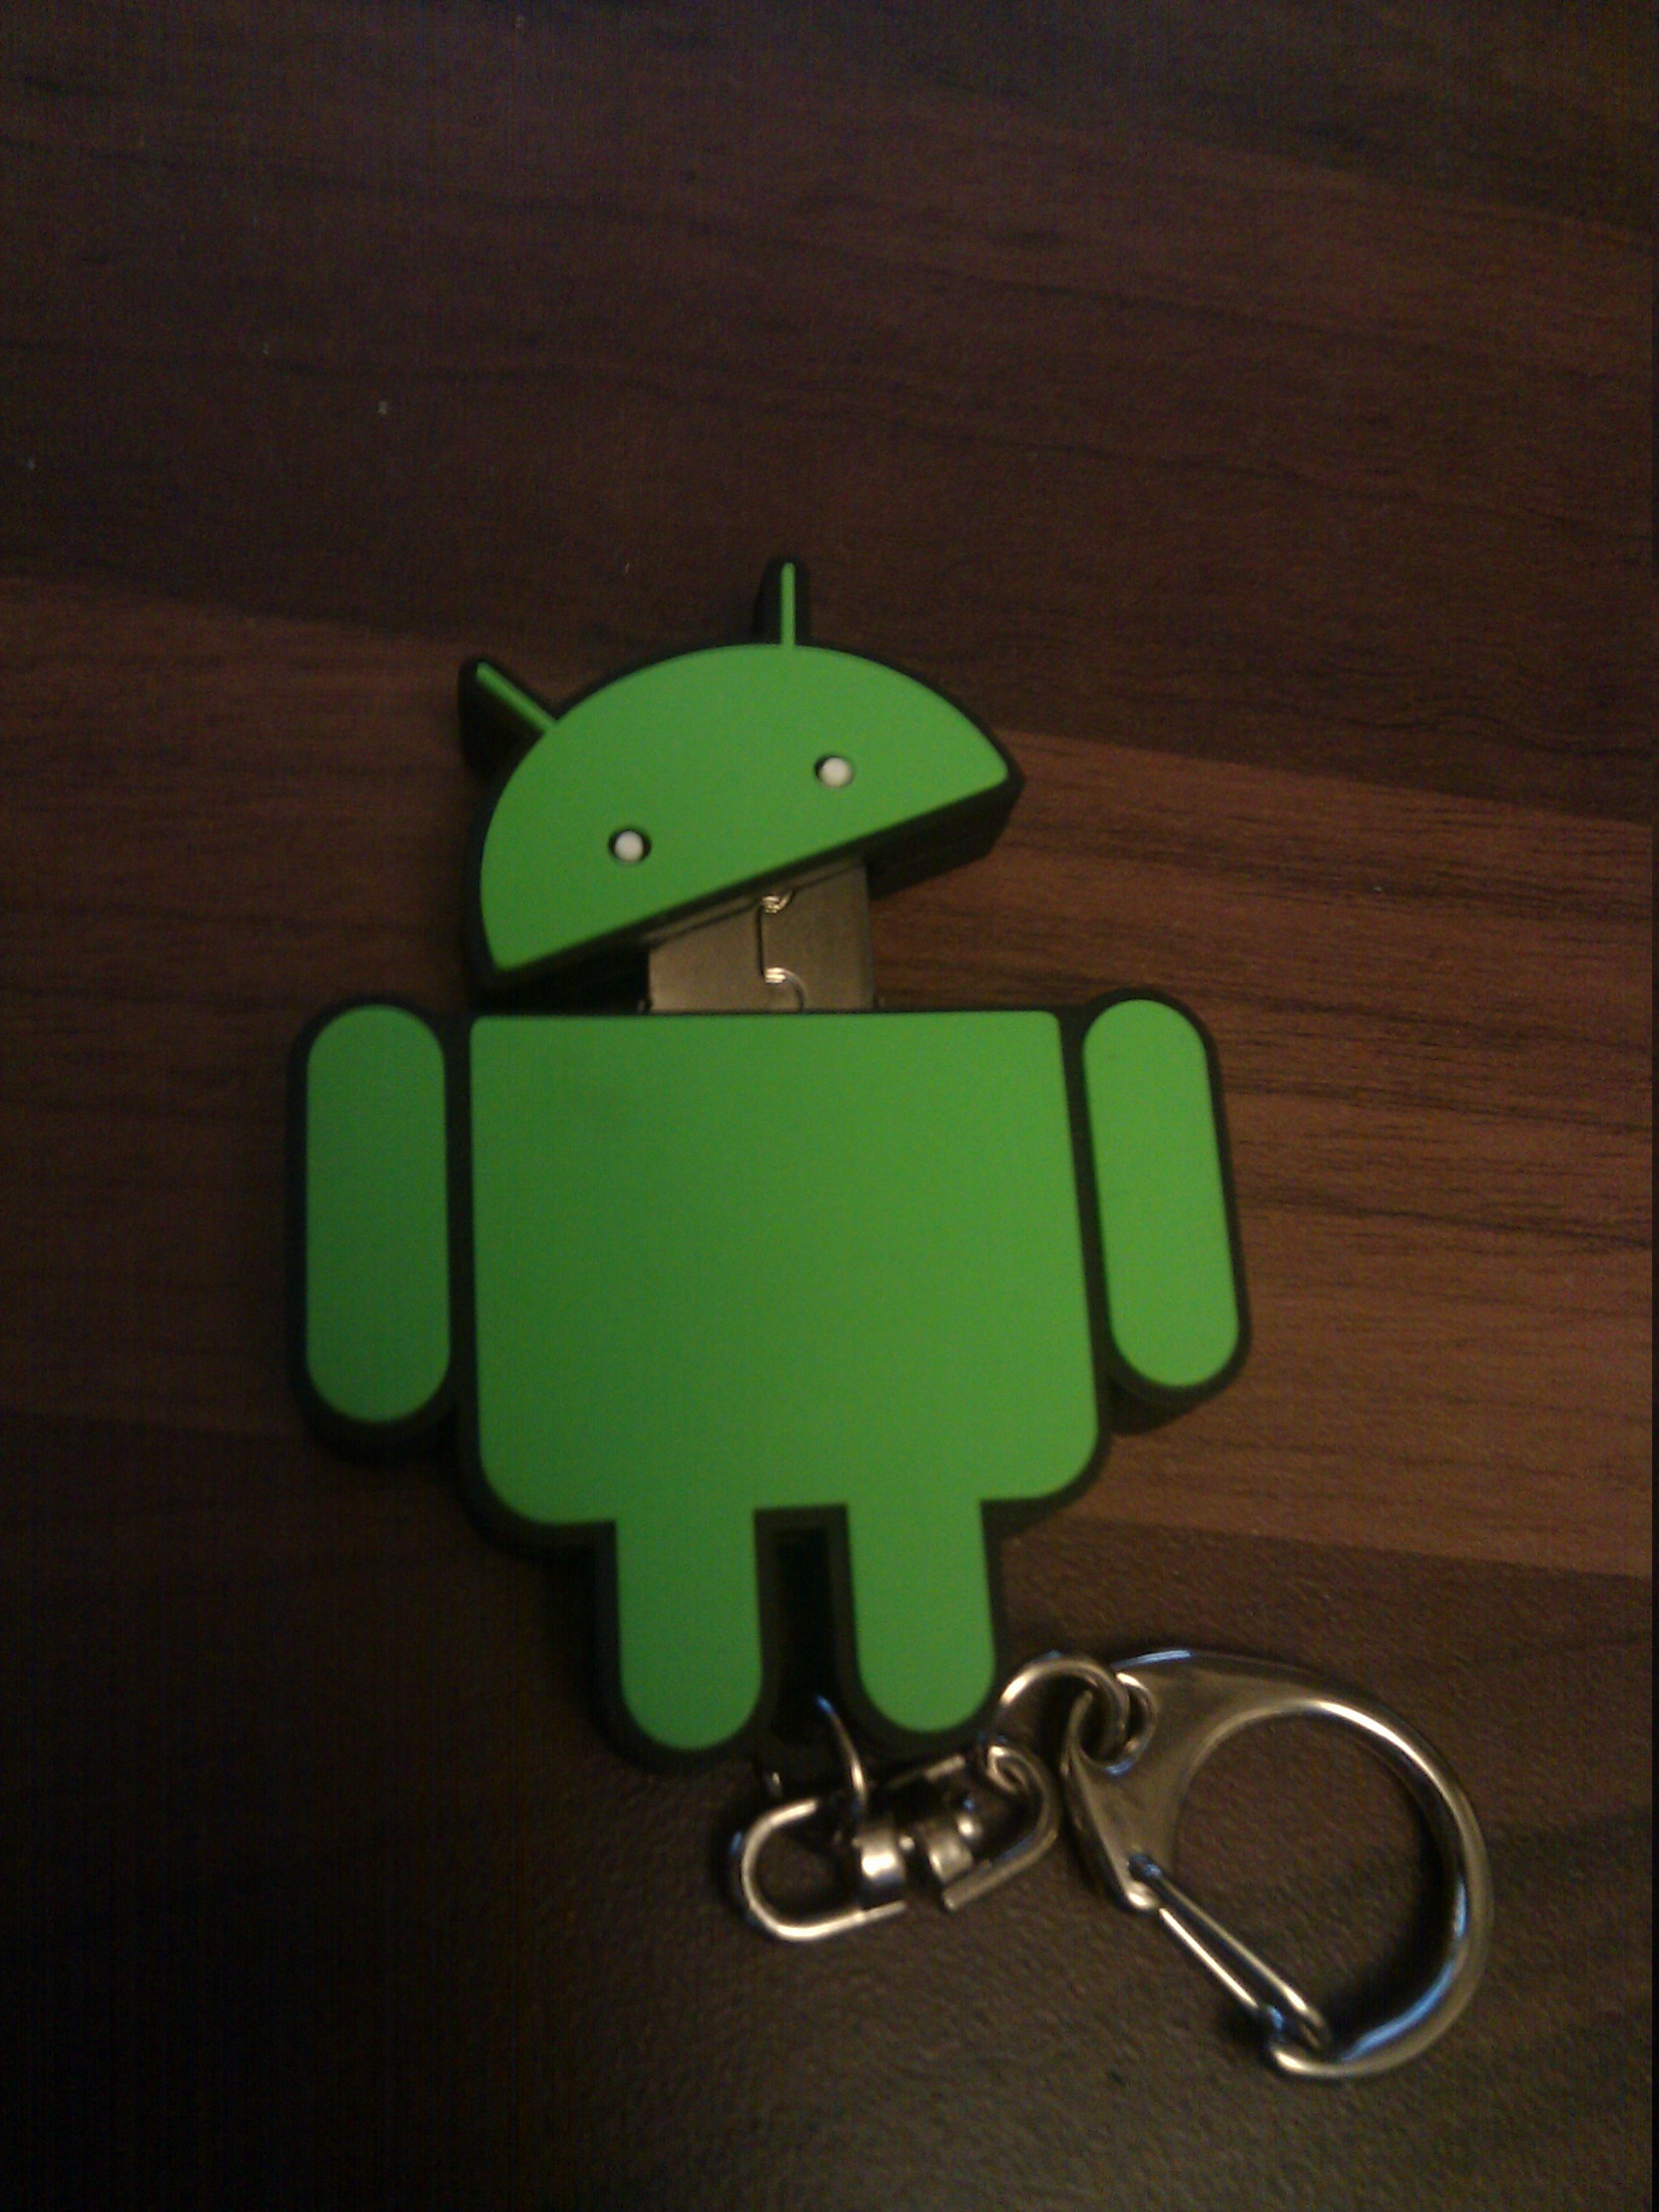 Android 2gb usb stick